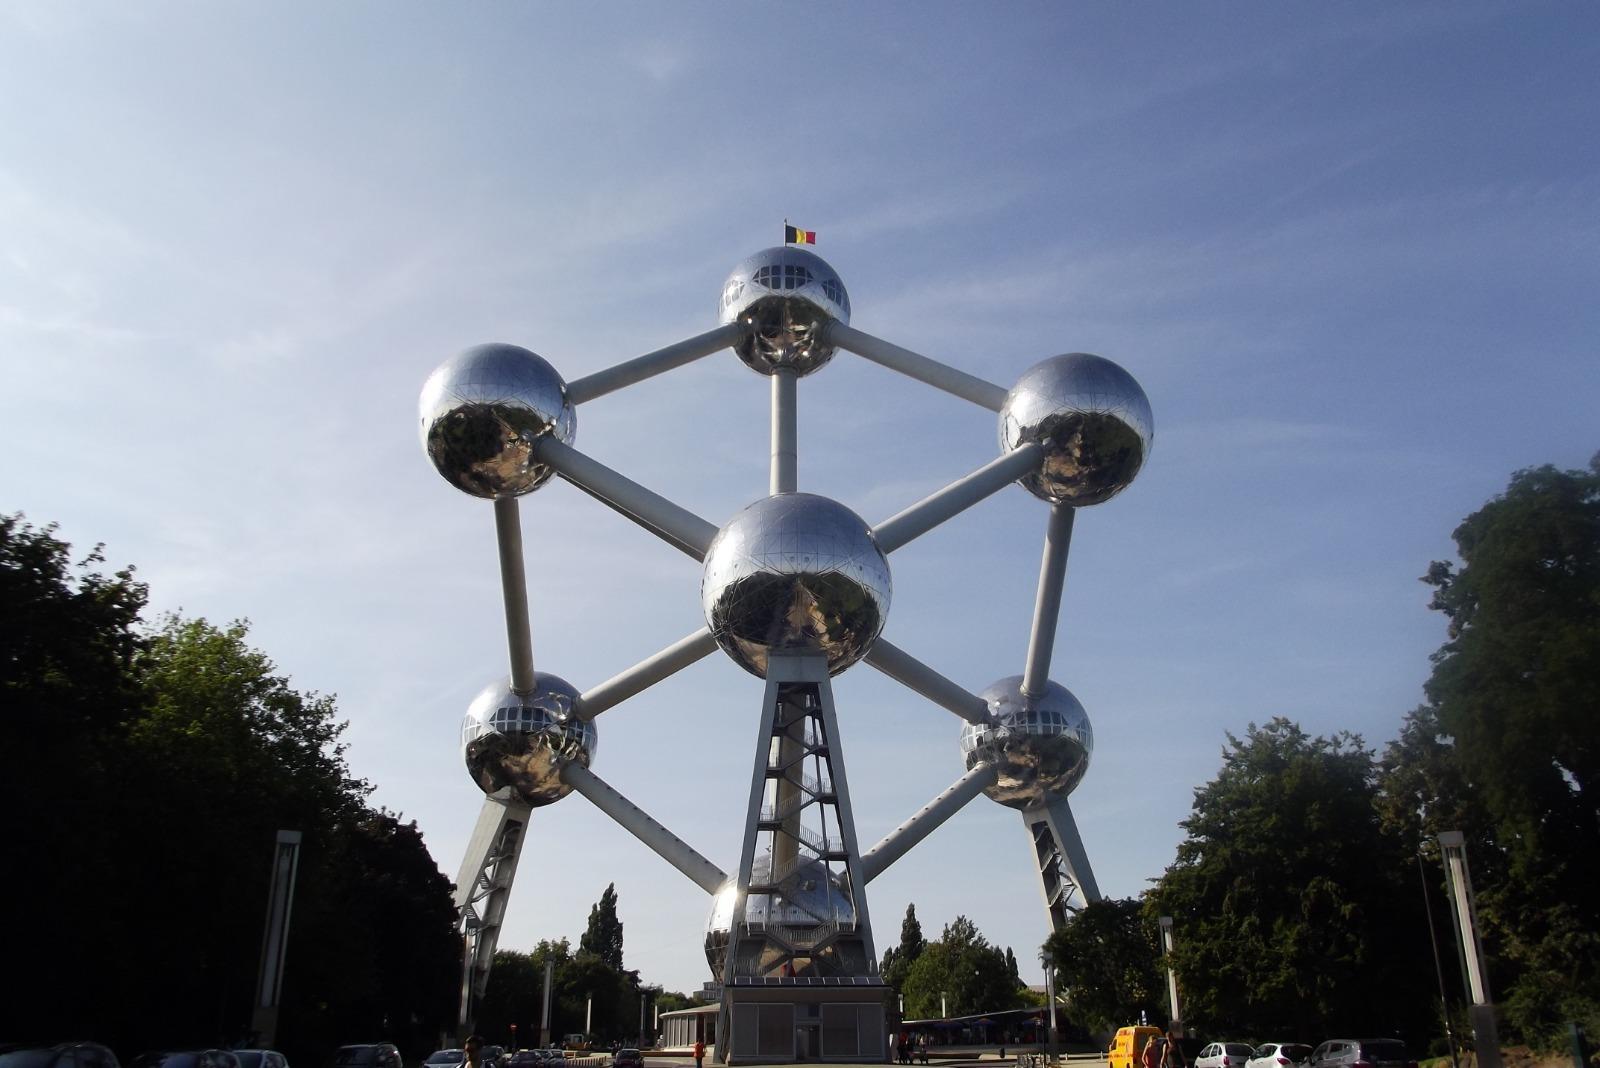 belgioelussemburgo42-1600418834.jpg